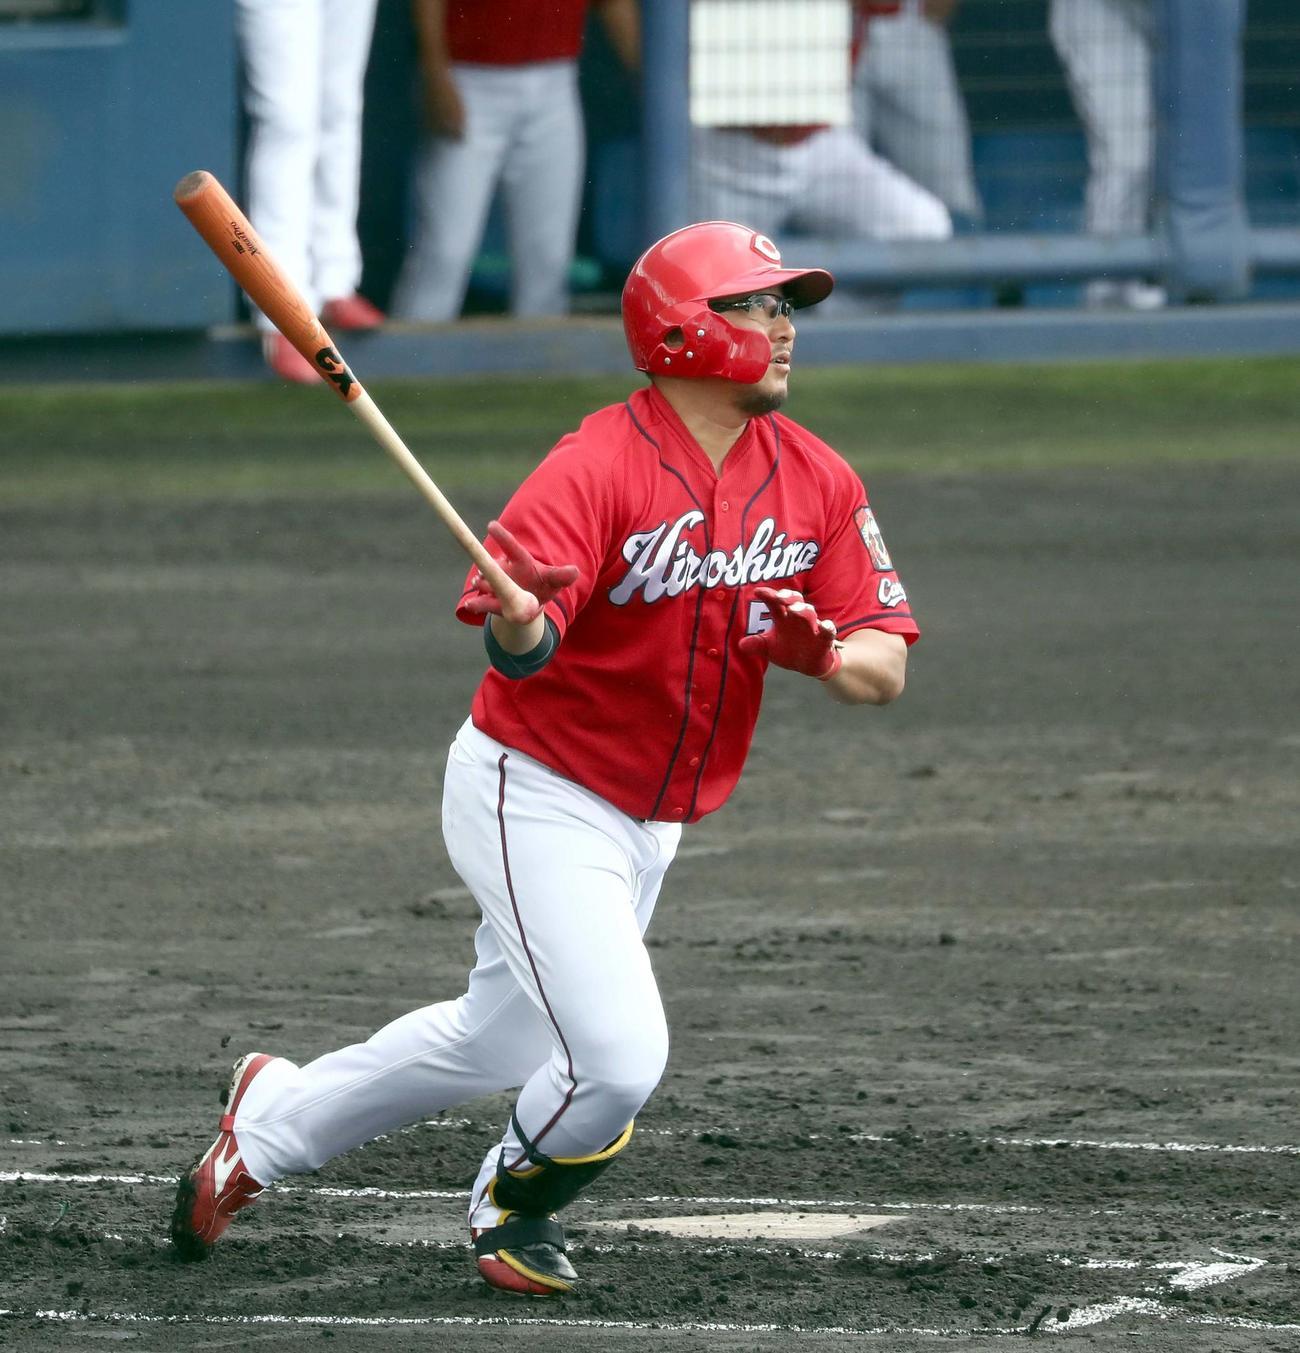 練習試合 日本ハム対広島 1回表広島2死二塁、右越え2点本塁打を放つ松山(撮影・黒川智章)